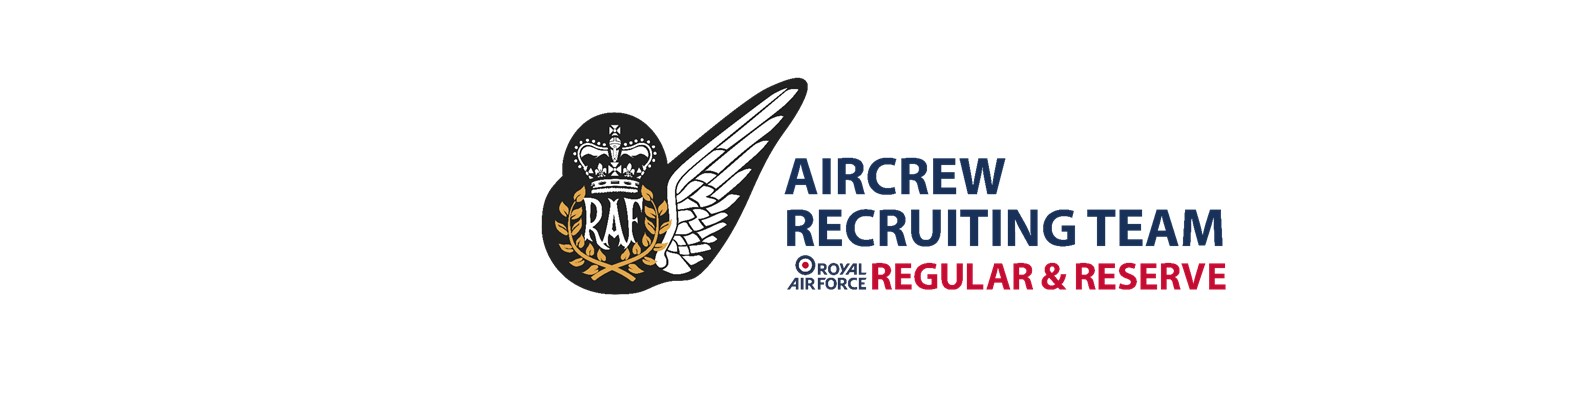 Aircrew Recruiting Slide – White